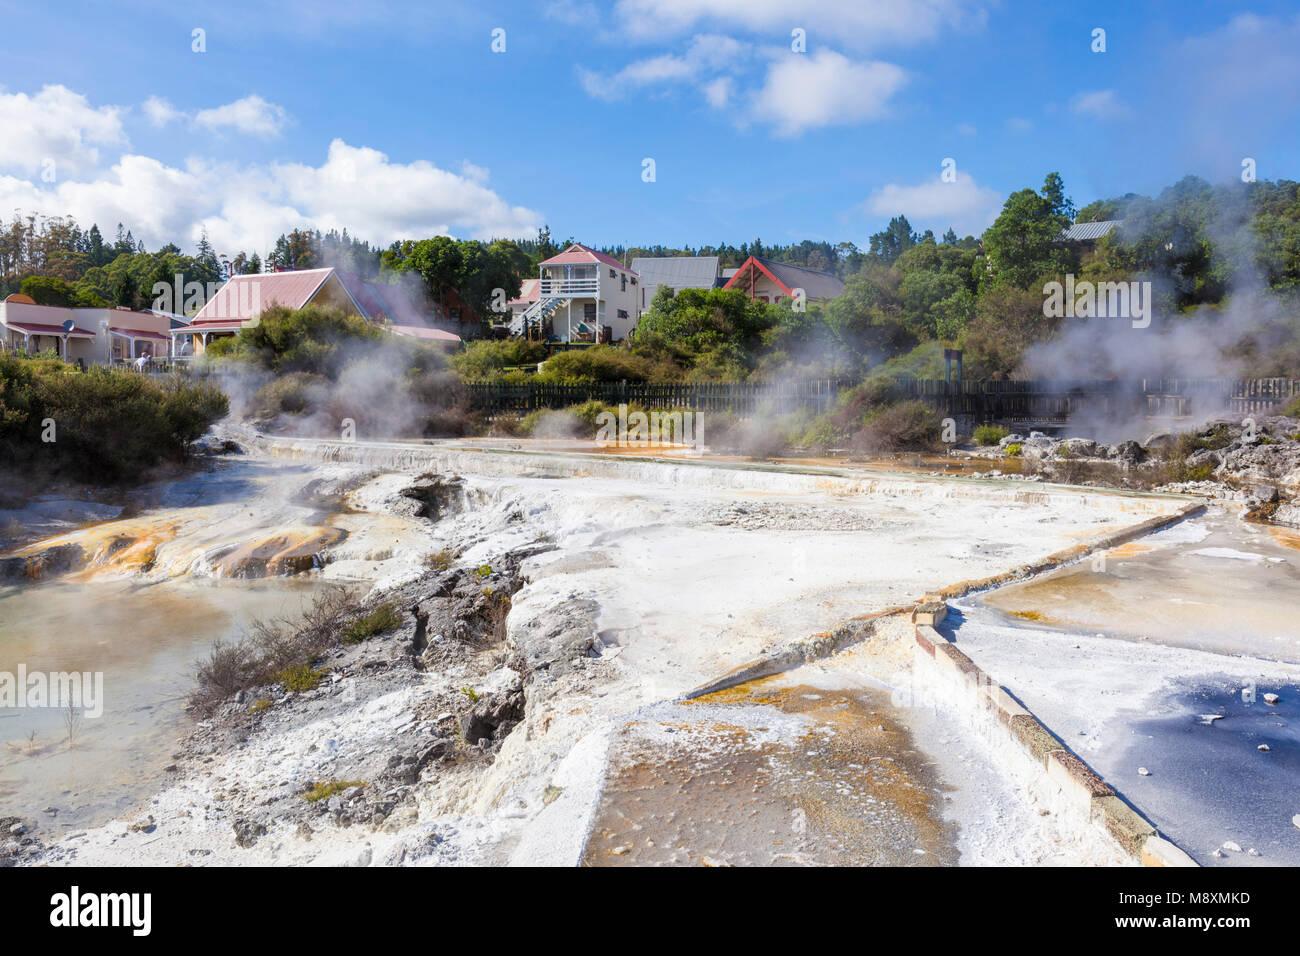 Nouvelle zélande Rotorua Nouvelle zélande Rotorua whakarewarewa terrasses avec minéral-run-off à Photo Stock